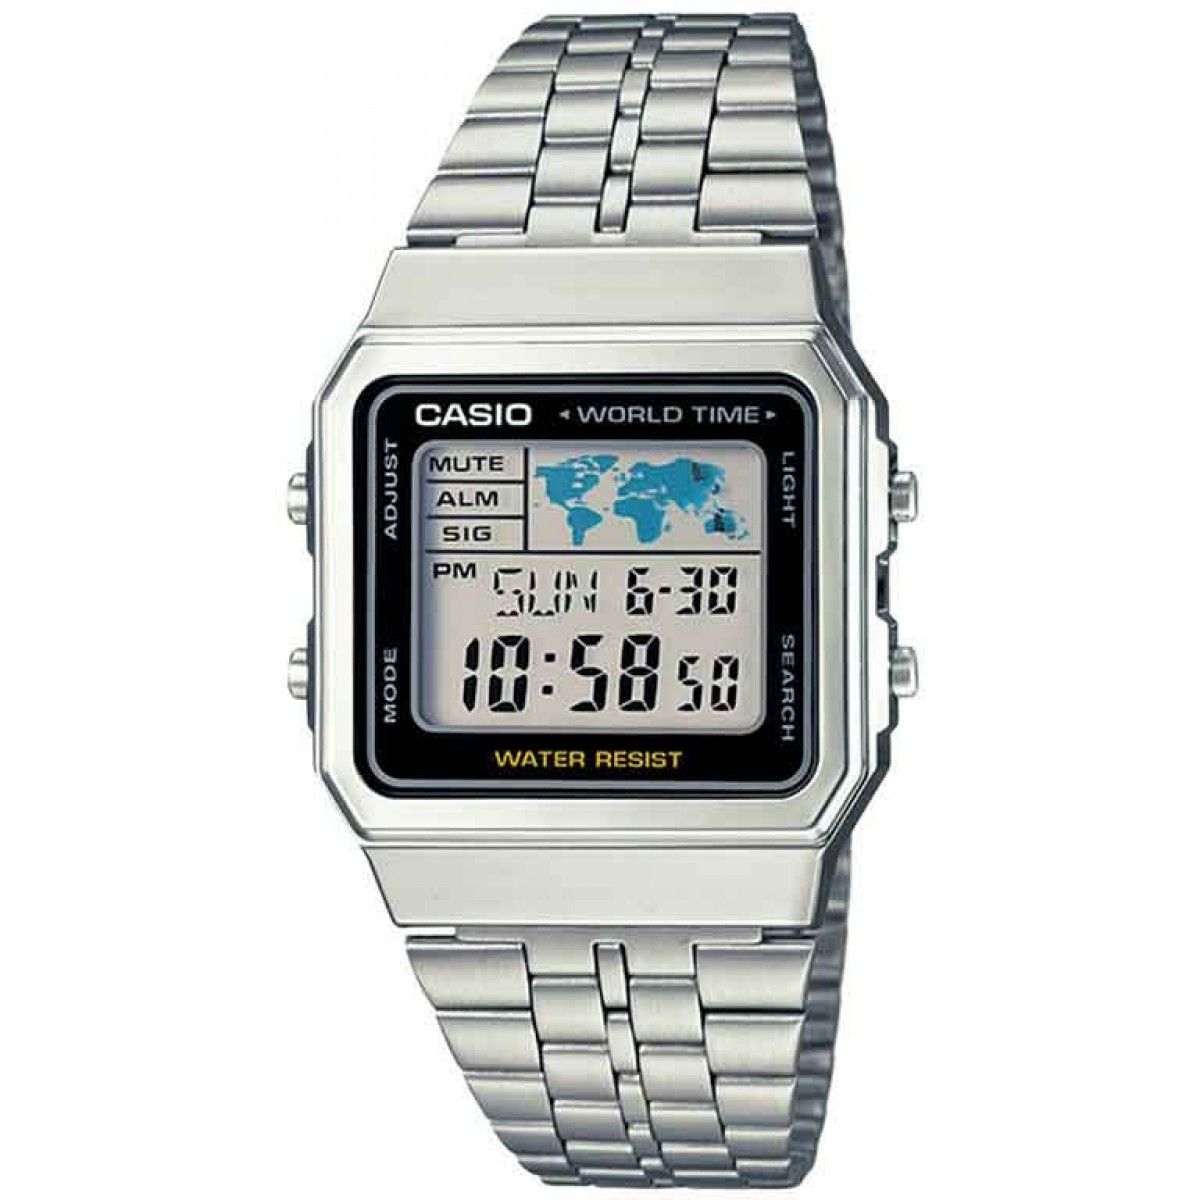 Relógio Casio Vintage World Time A500WA-1DF